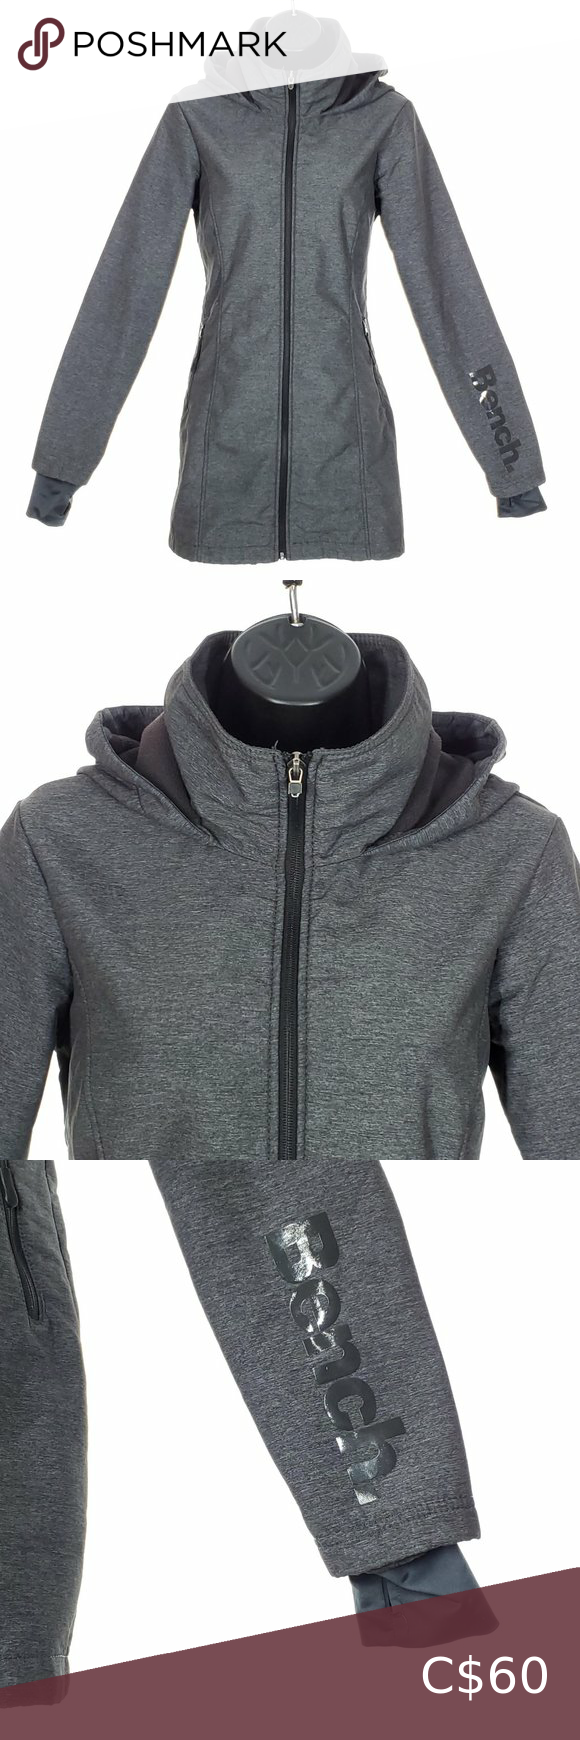 Bench Fall Jacket Fleece Lined Coat Hooded Long Fall Jackets Jackets Bench Jackets [ 1740 x 580 Pixel ]